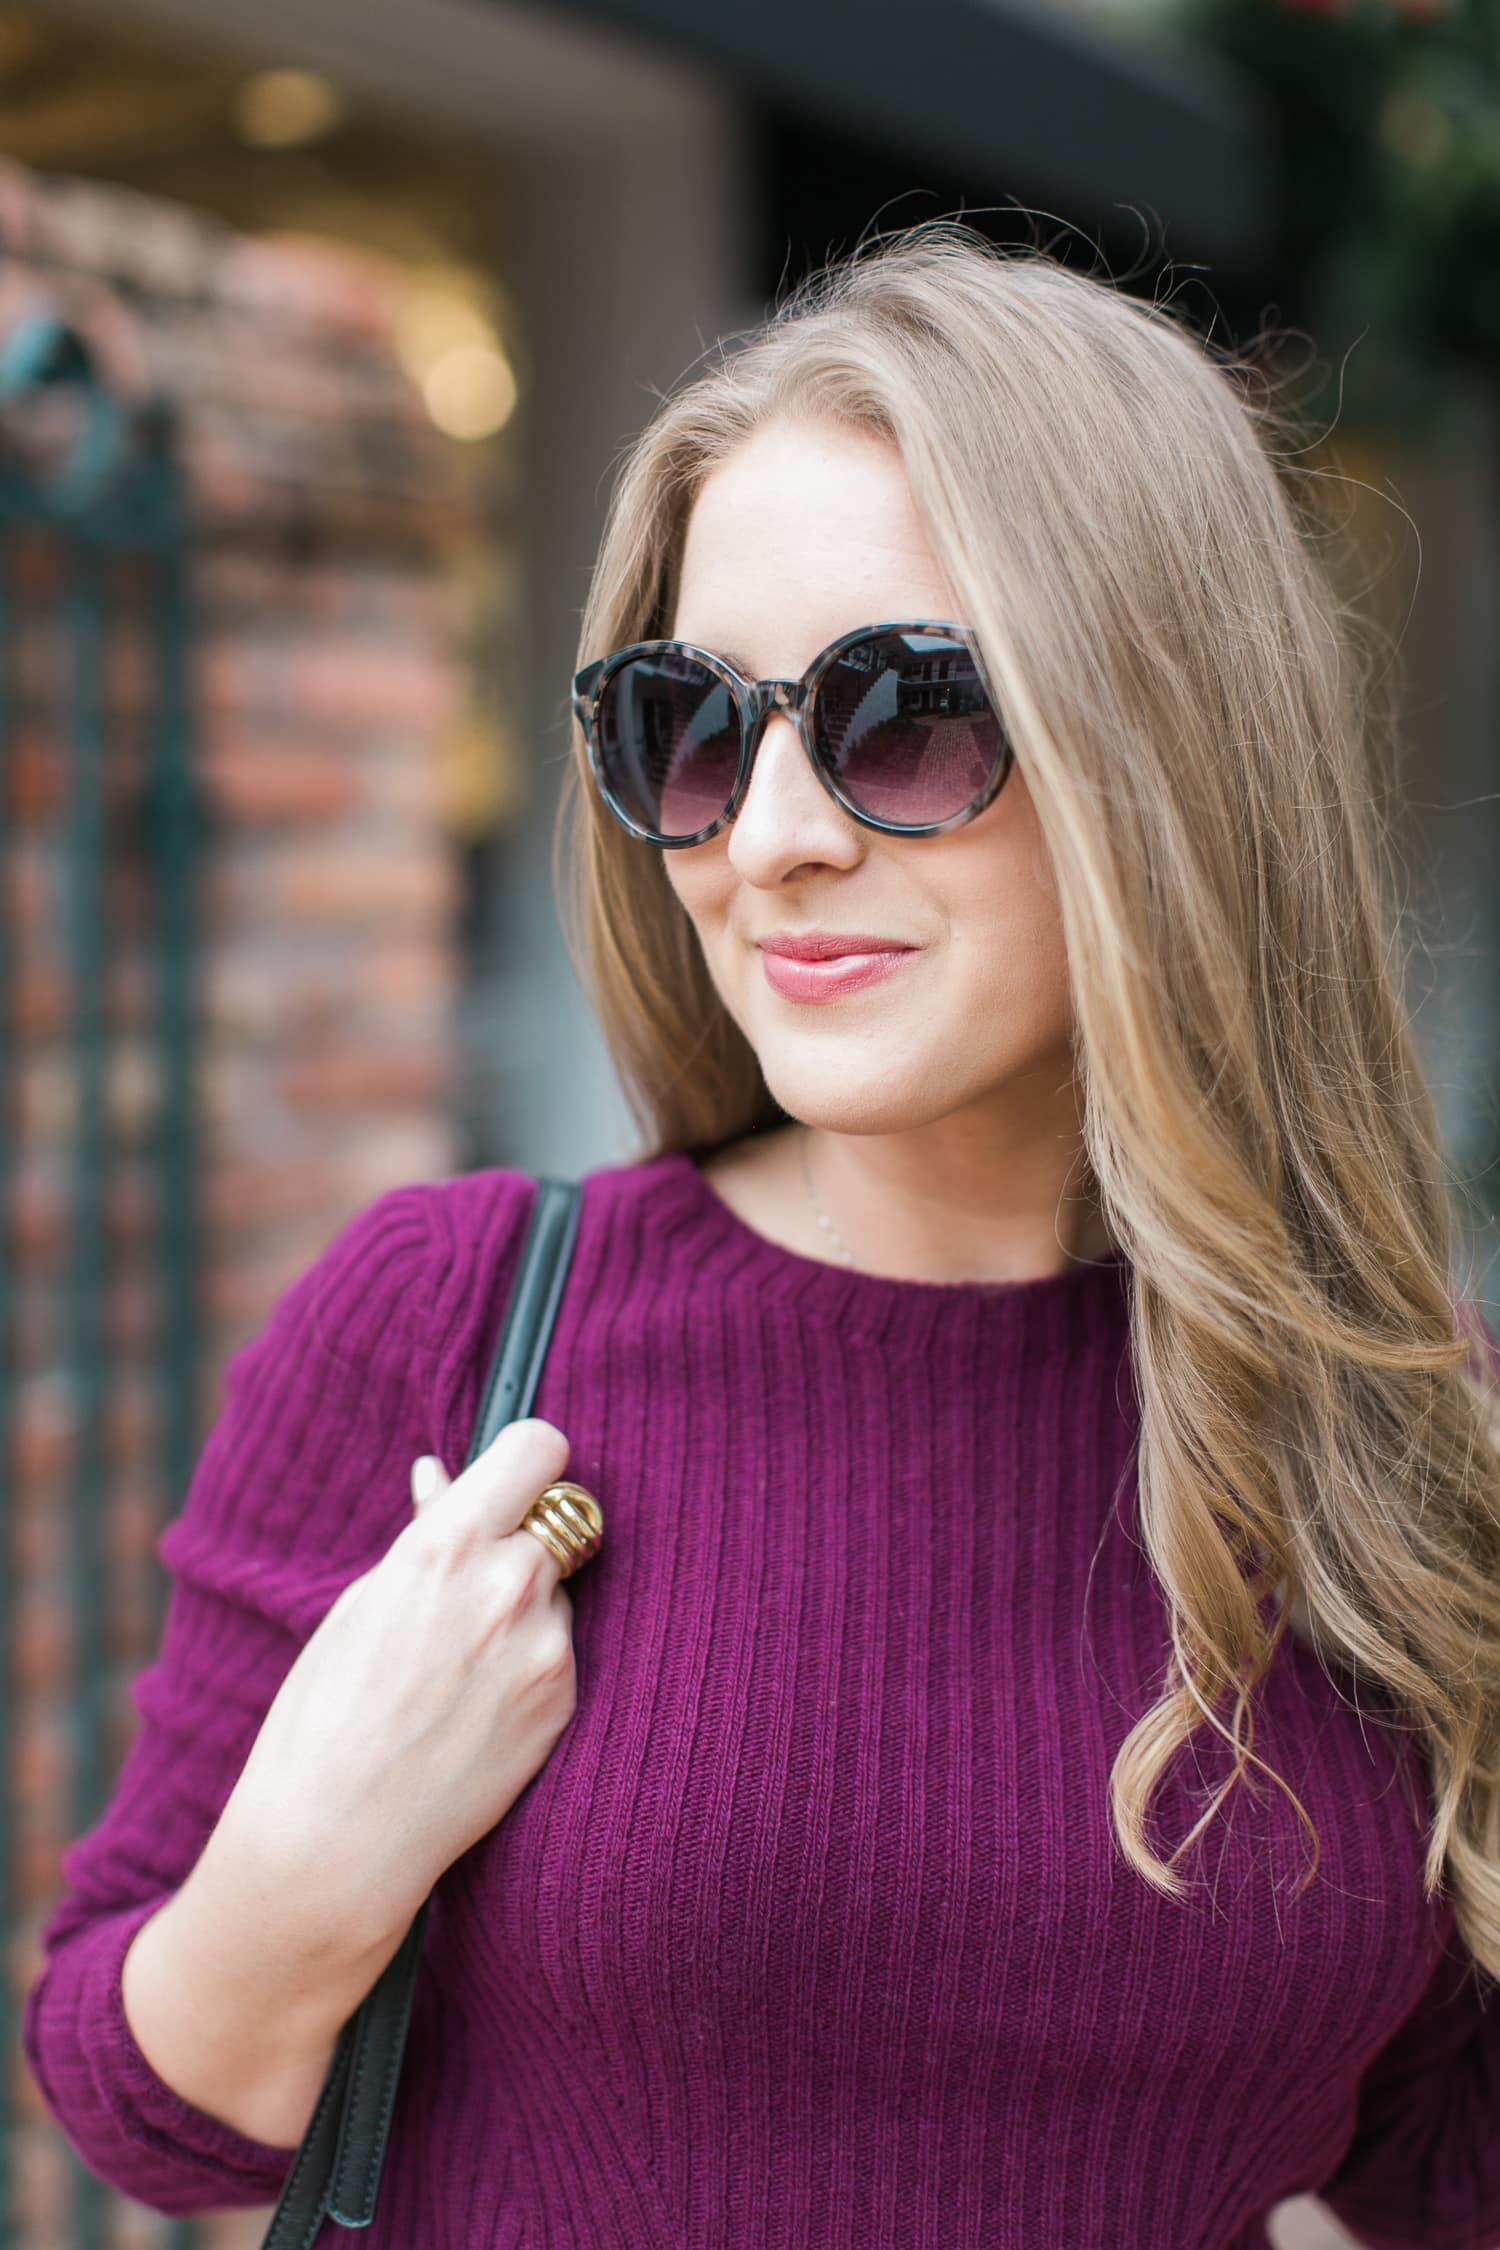 foster-grant-pf-41-retro-round-wayfarer-sunglasses-ash-blonde-curls-ashley-brooke-nicholas-023